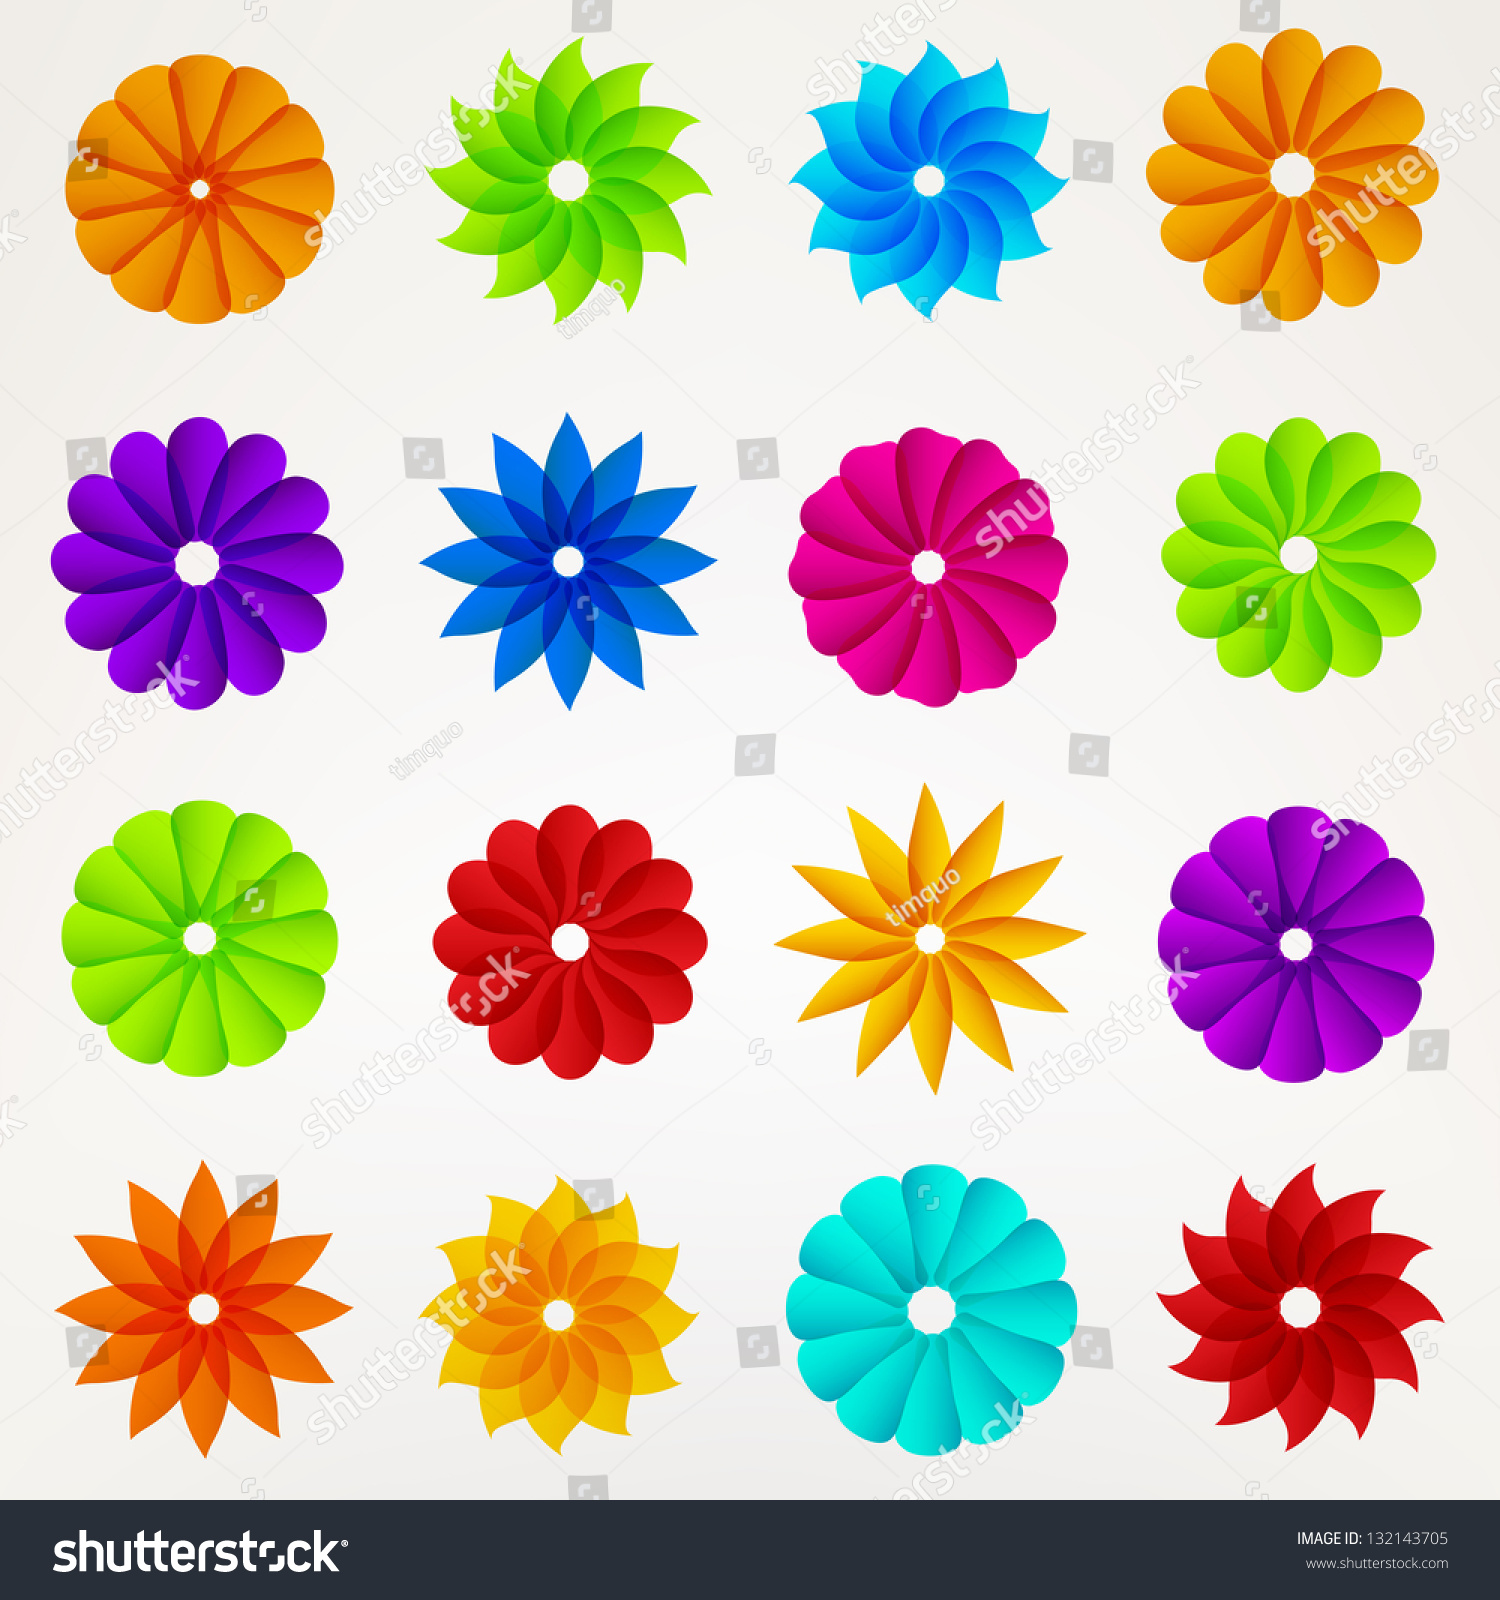 Set Of Black Flower Design Elements Vector Illustration: Flower Silhouette Set Design Elements Eps10 Stock Vector